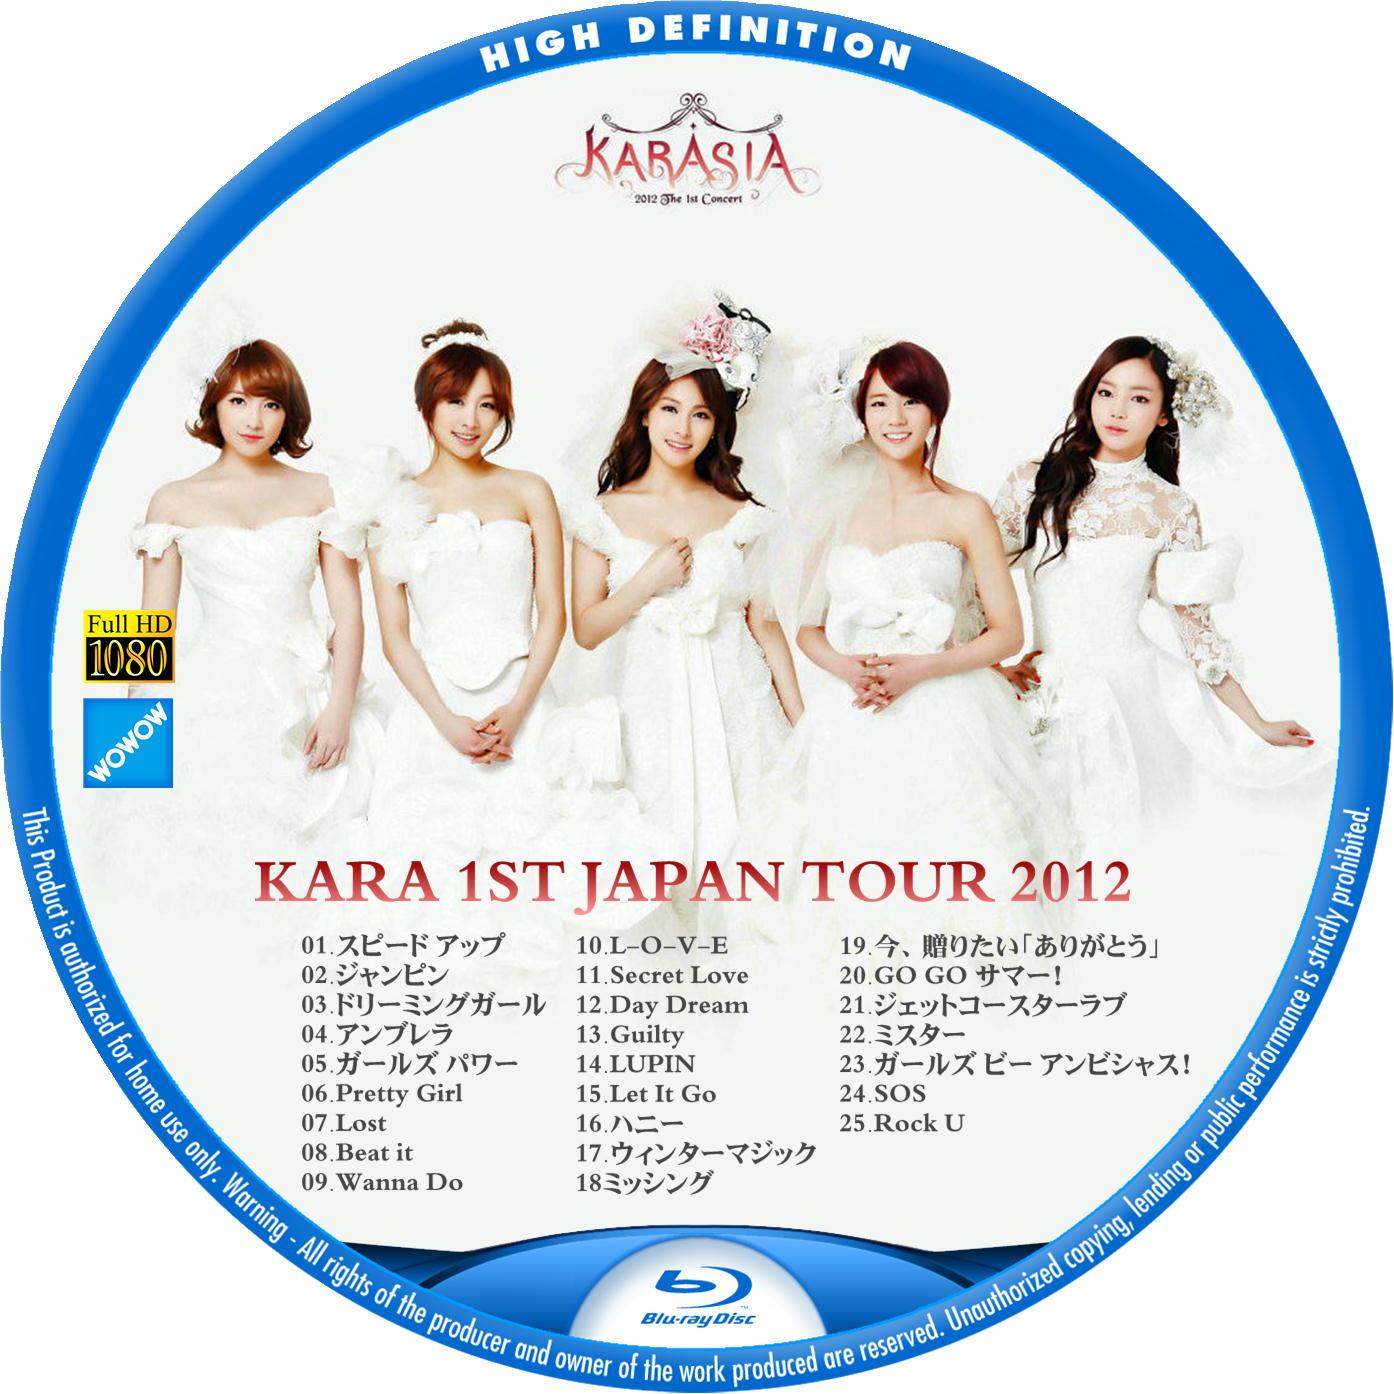 KARA 1ST JAPAN TOUR 2012 BDラベル